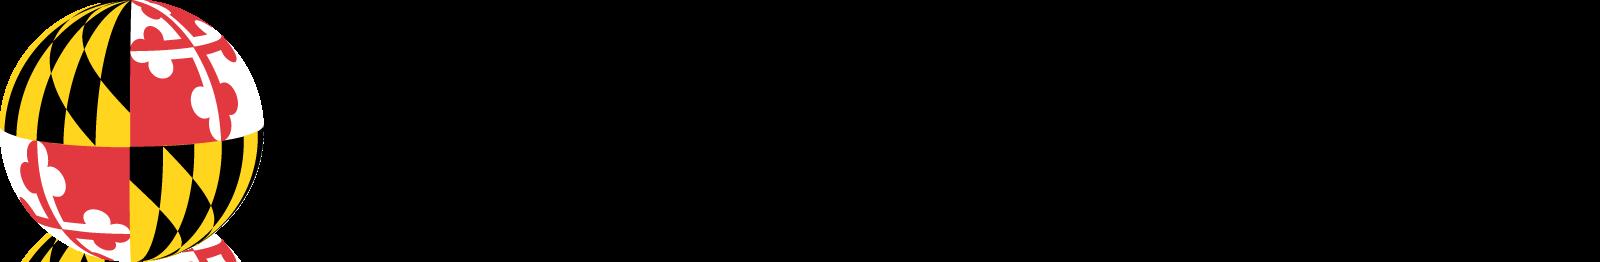 umd-logo